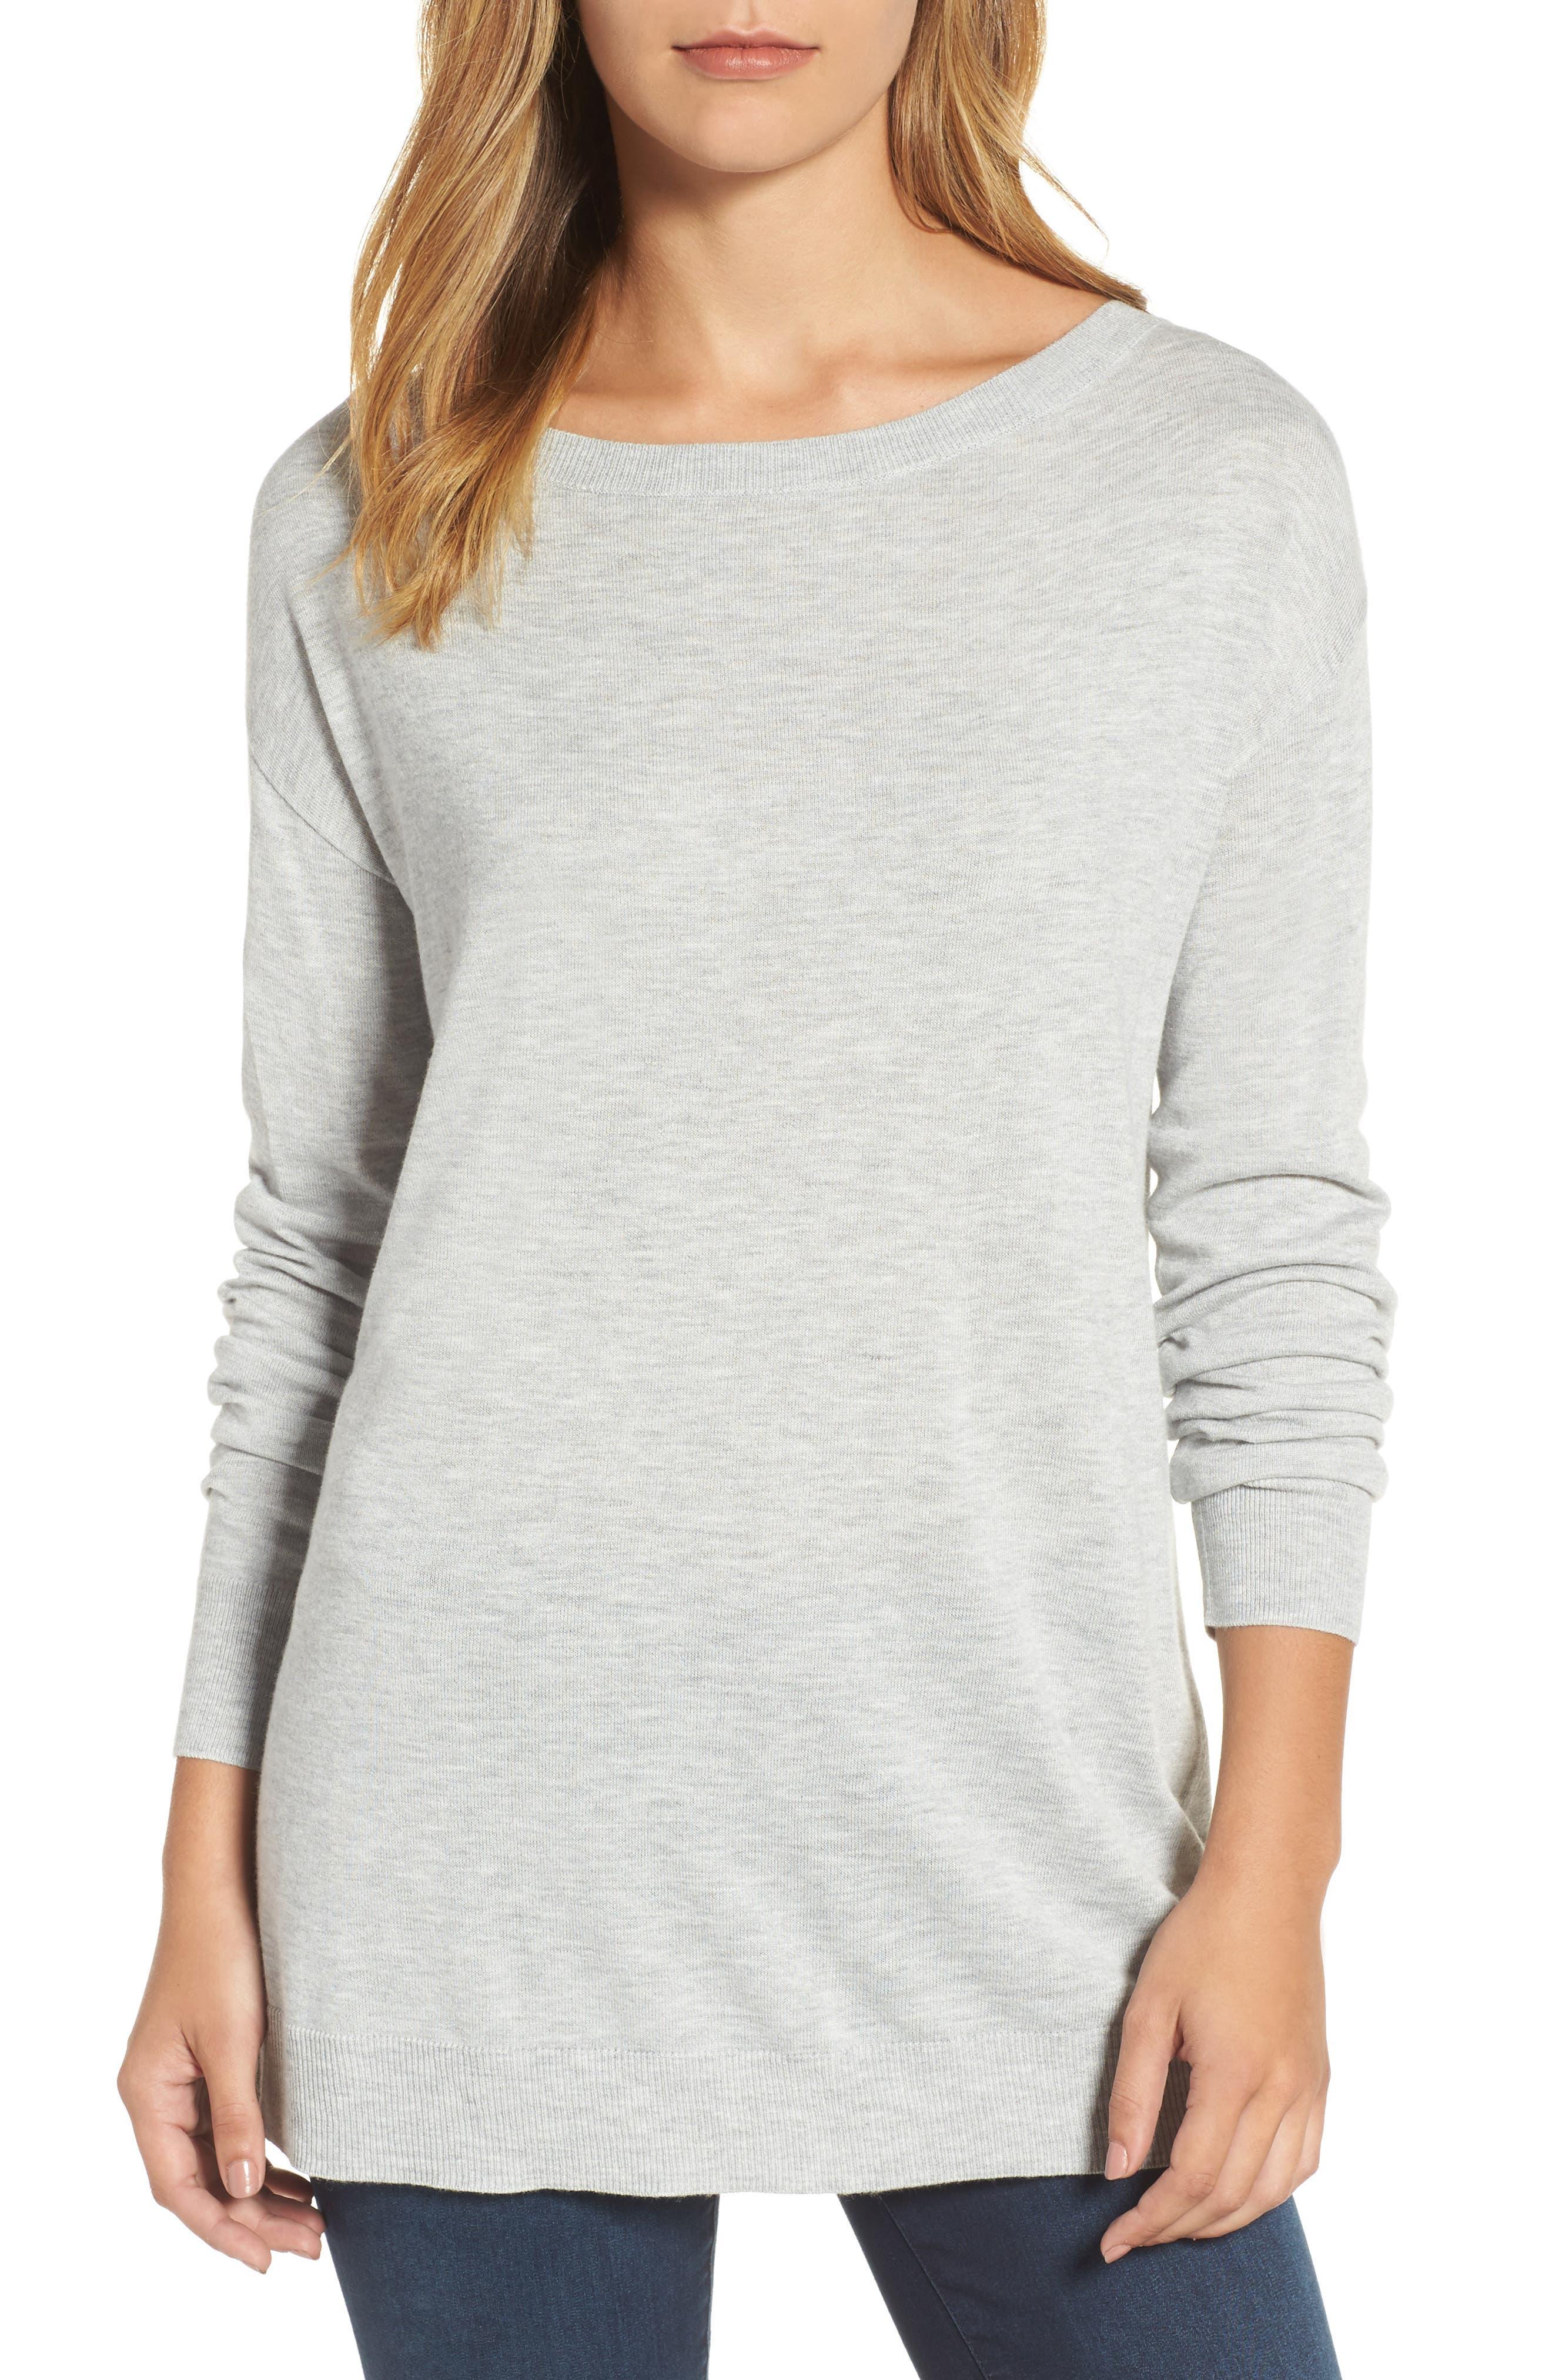 Main Image - Halogen® Boatneck Tunic Sweater (Regular & Petite)